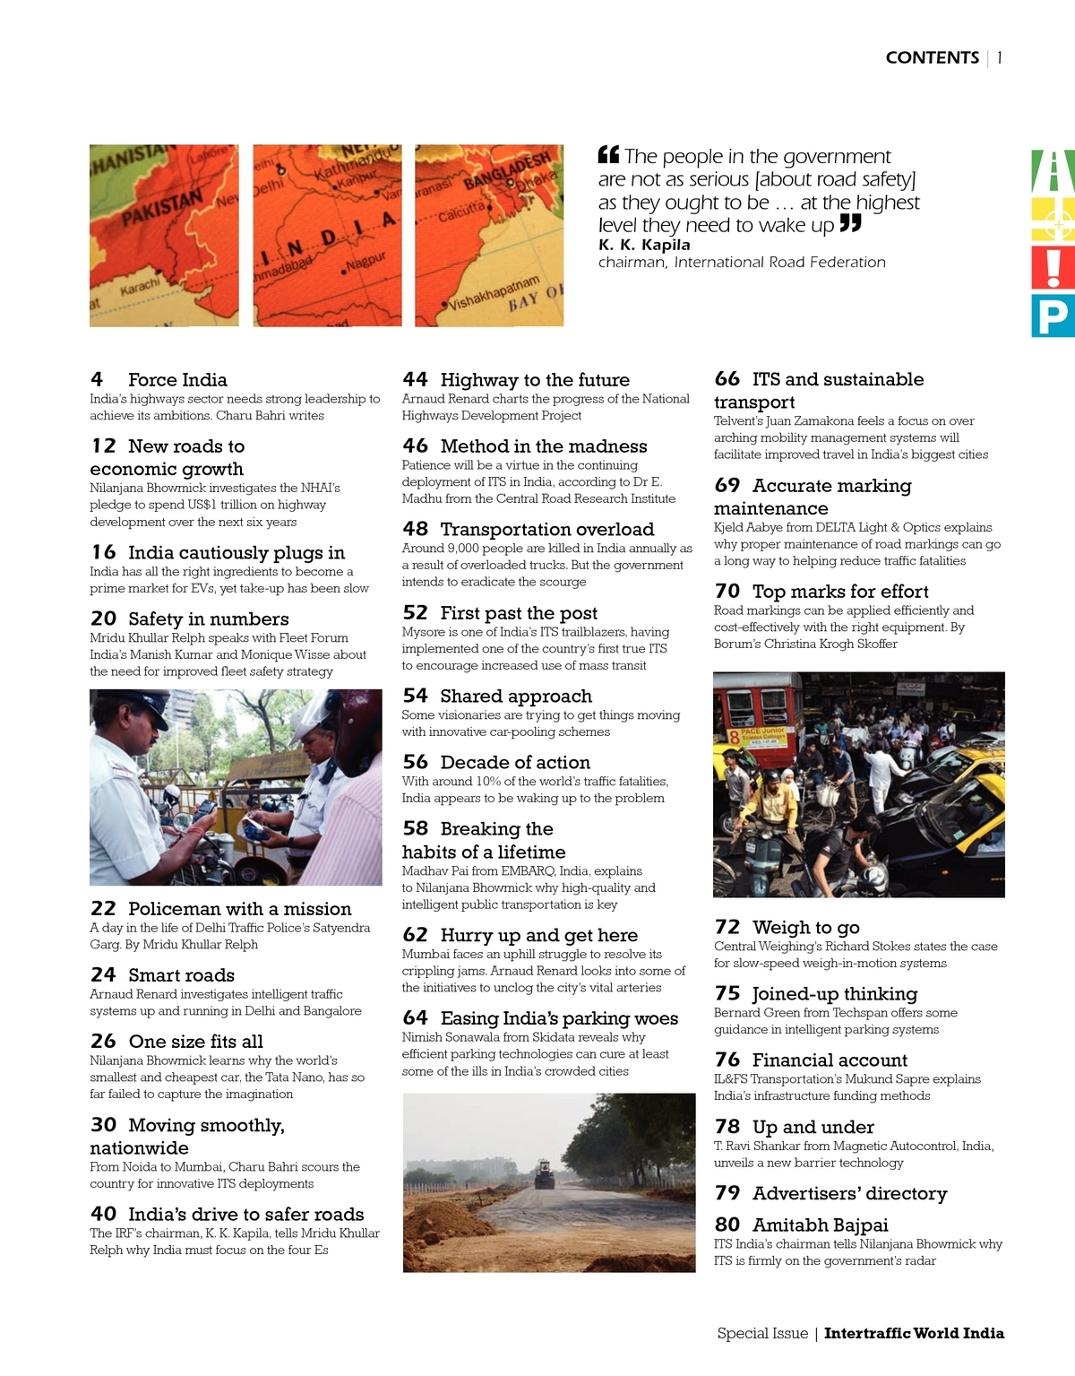 India 2011 Special Issue Intertraffic World - UKi